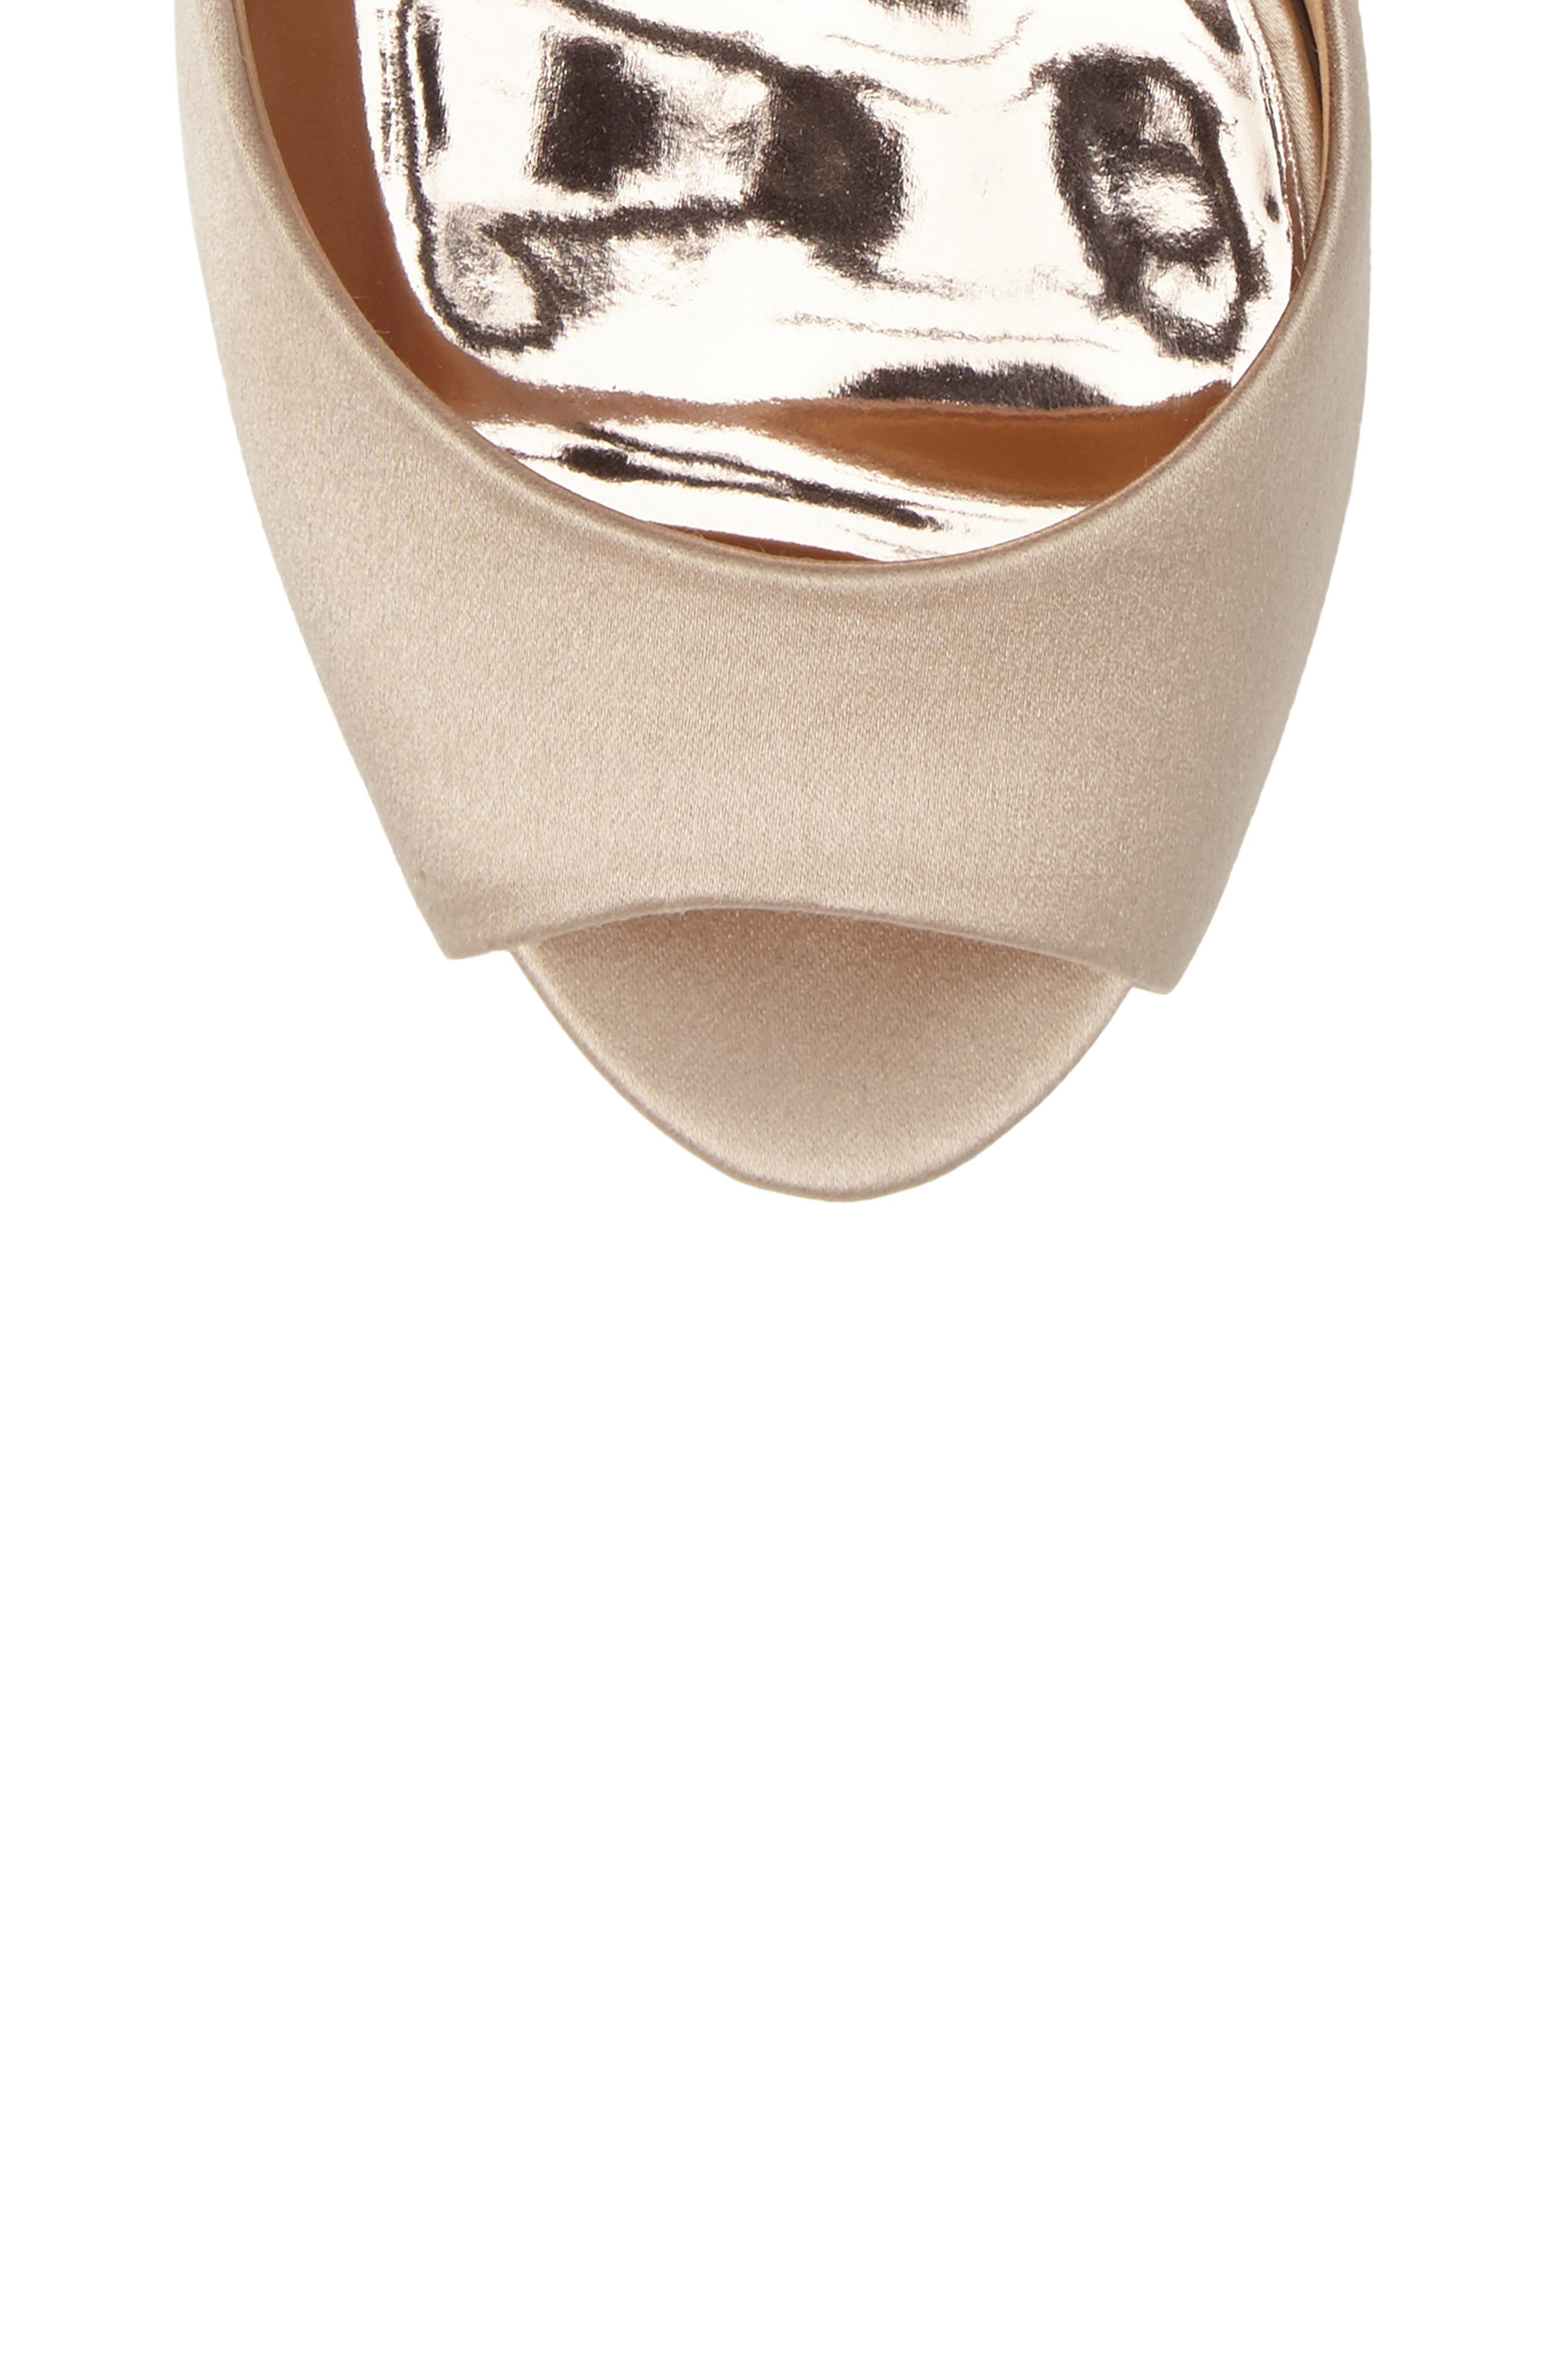 Badgley Micshka Karson Embellished Peep Toe Pump,                             Alternate thumbnail 14, color,